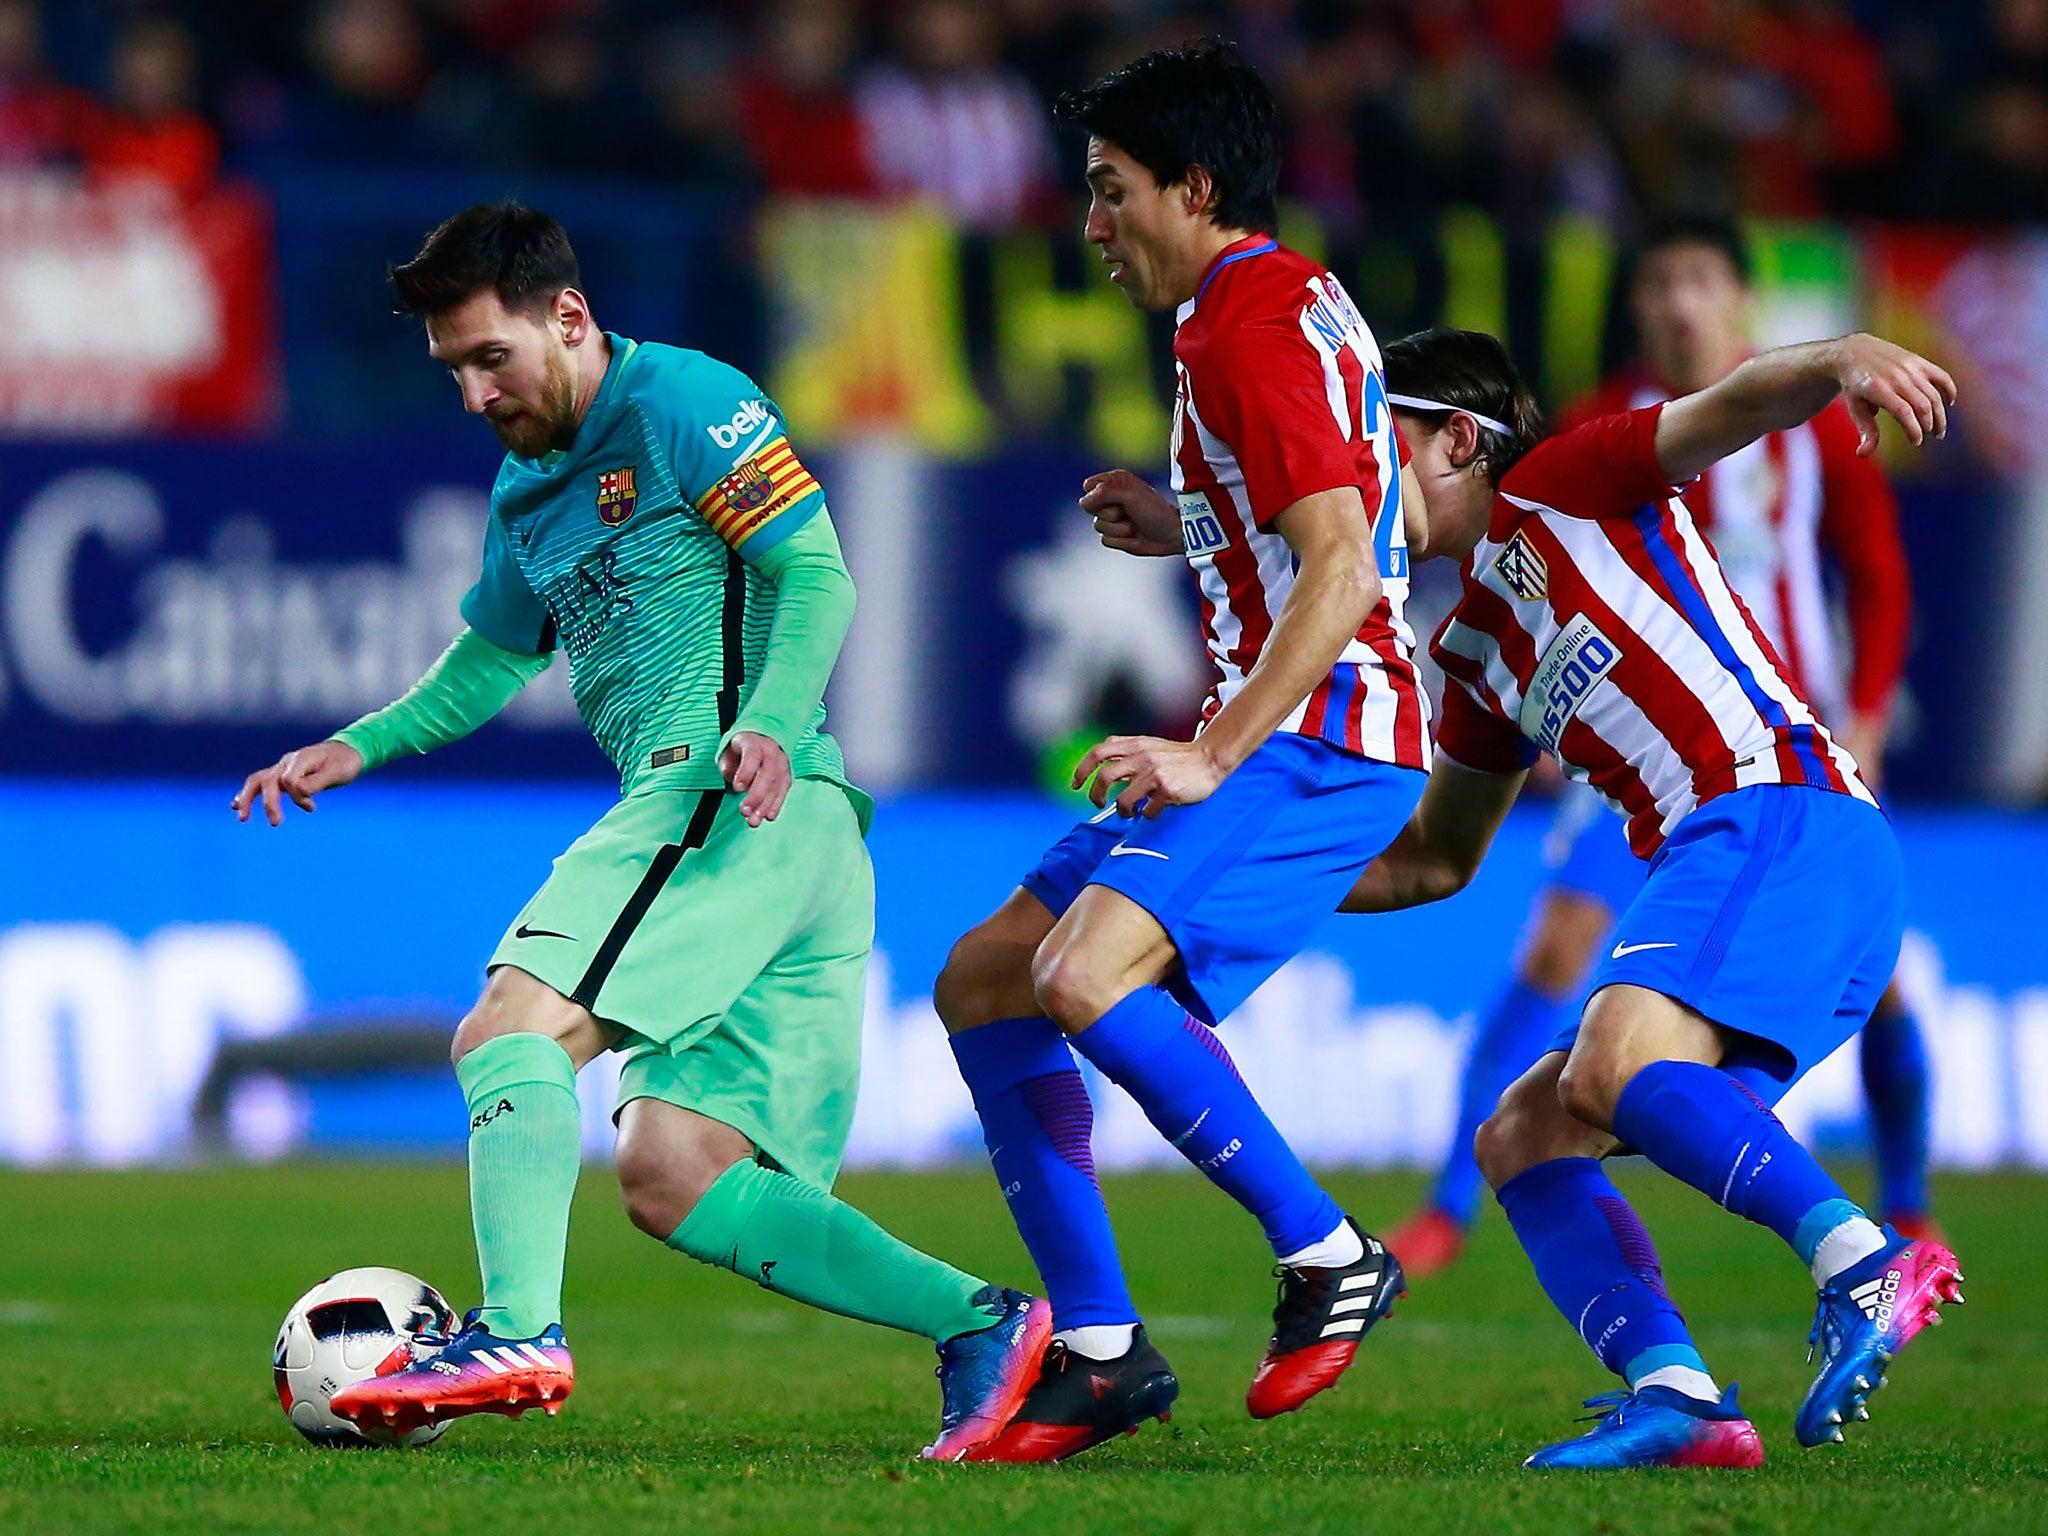 atl�tico madrid vs barcelona - photo #16